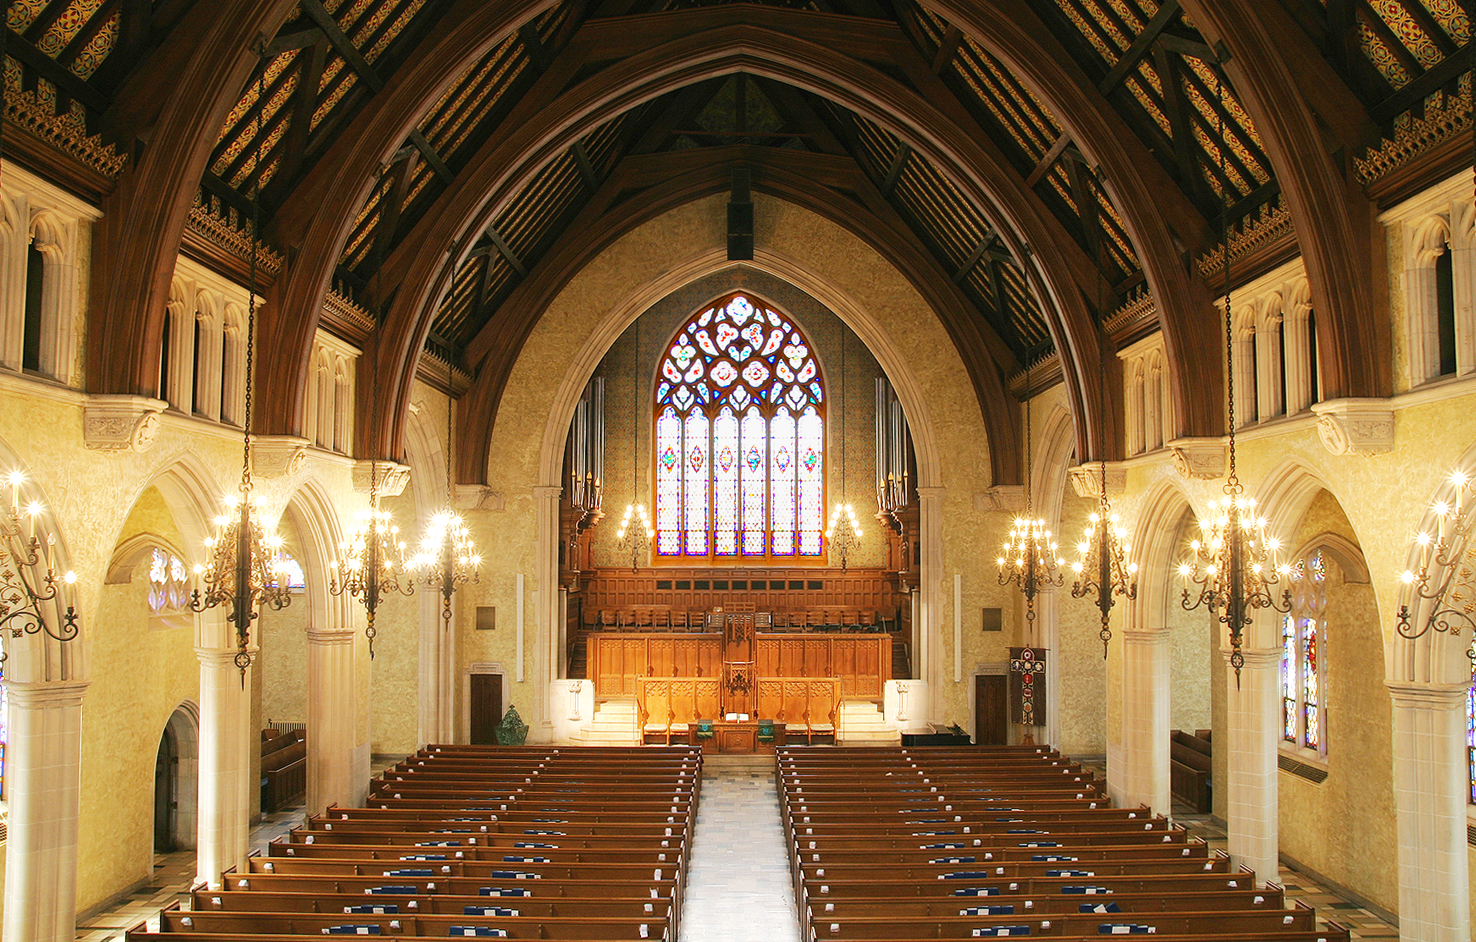 Idlewild Presbyterian